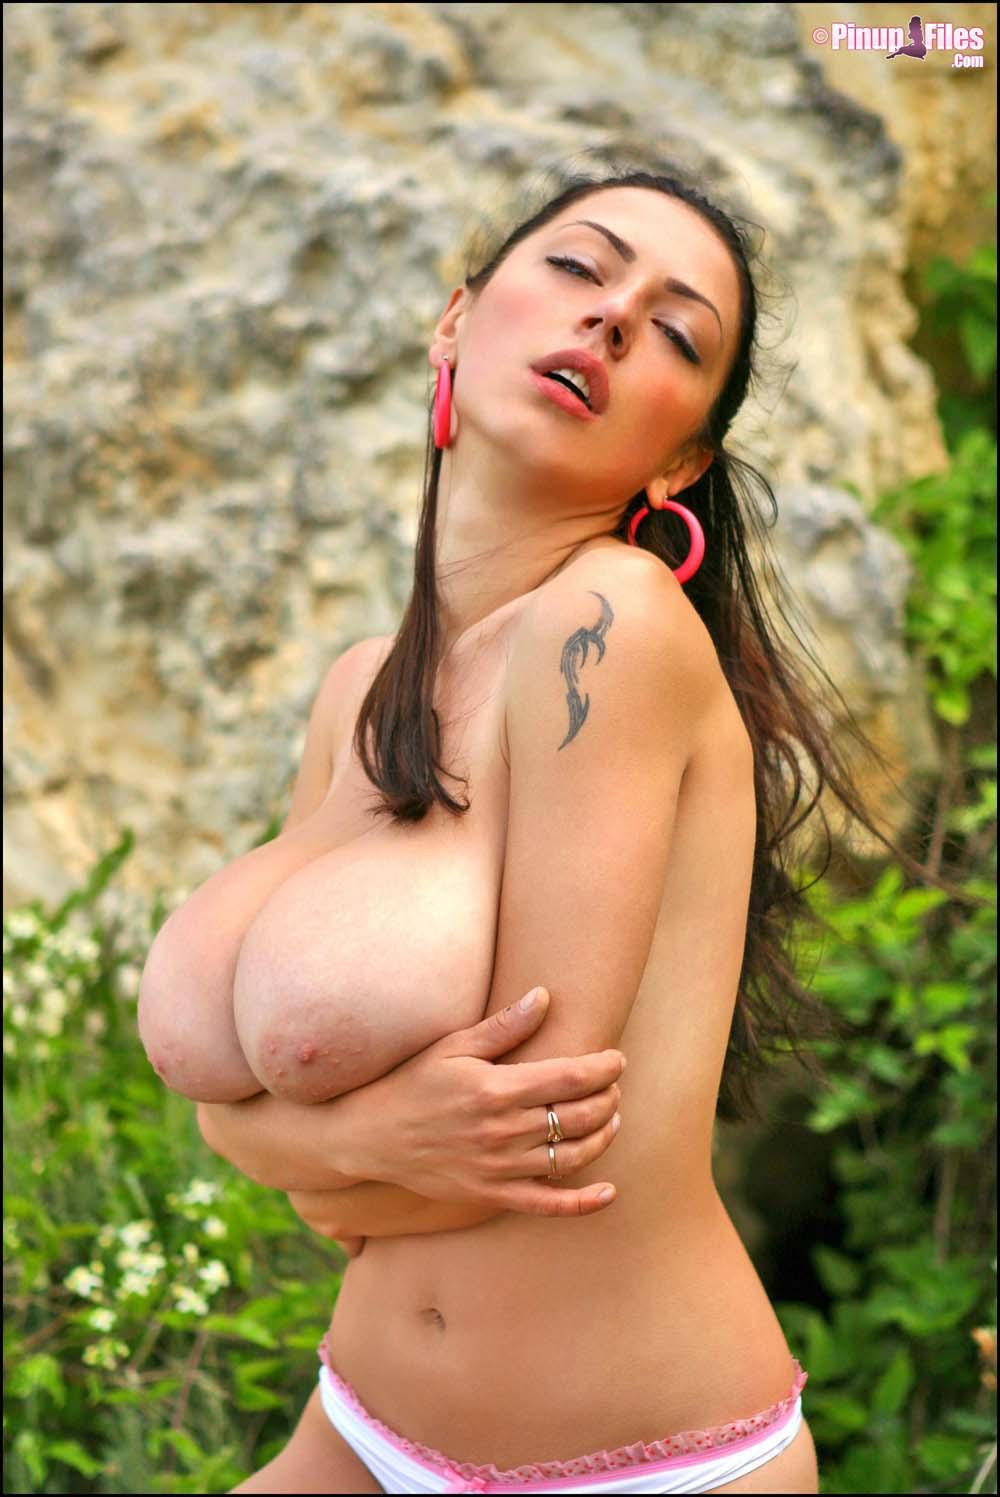 hijab-girl-nude-big-tites-chicks-on-rocks-busty